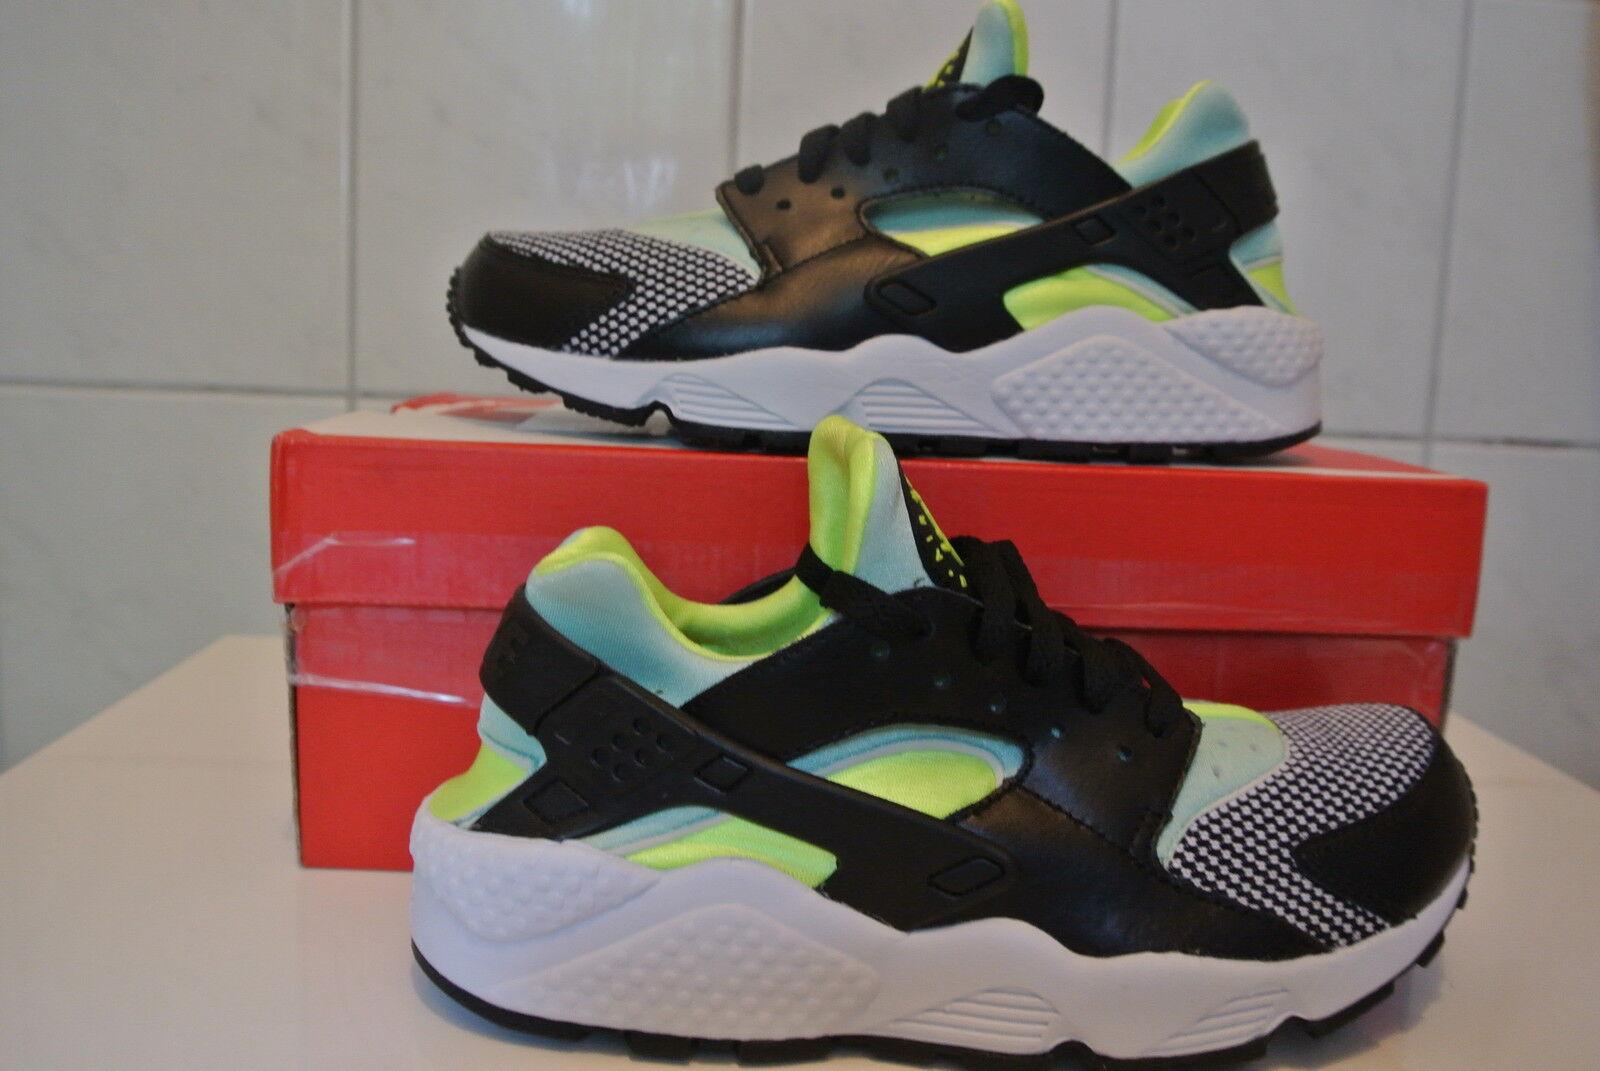 Zapatos promocionales para hombres y mujeres WMNS Nike Air Huarache Run Gr. wählbar Neu & OVP 634835 037